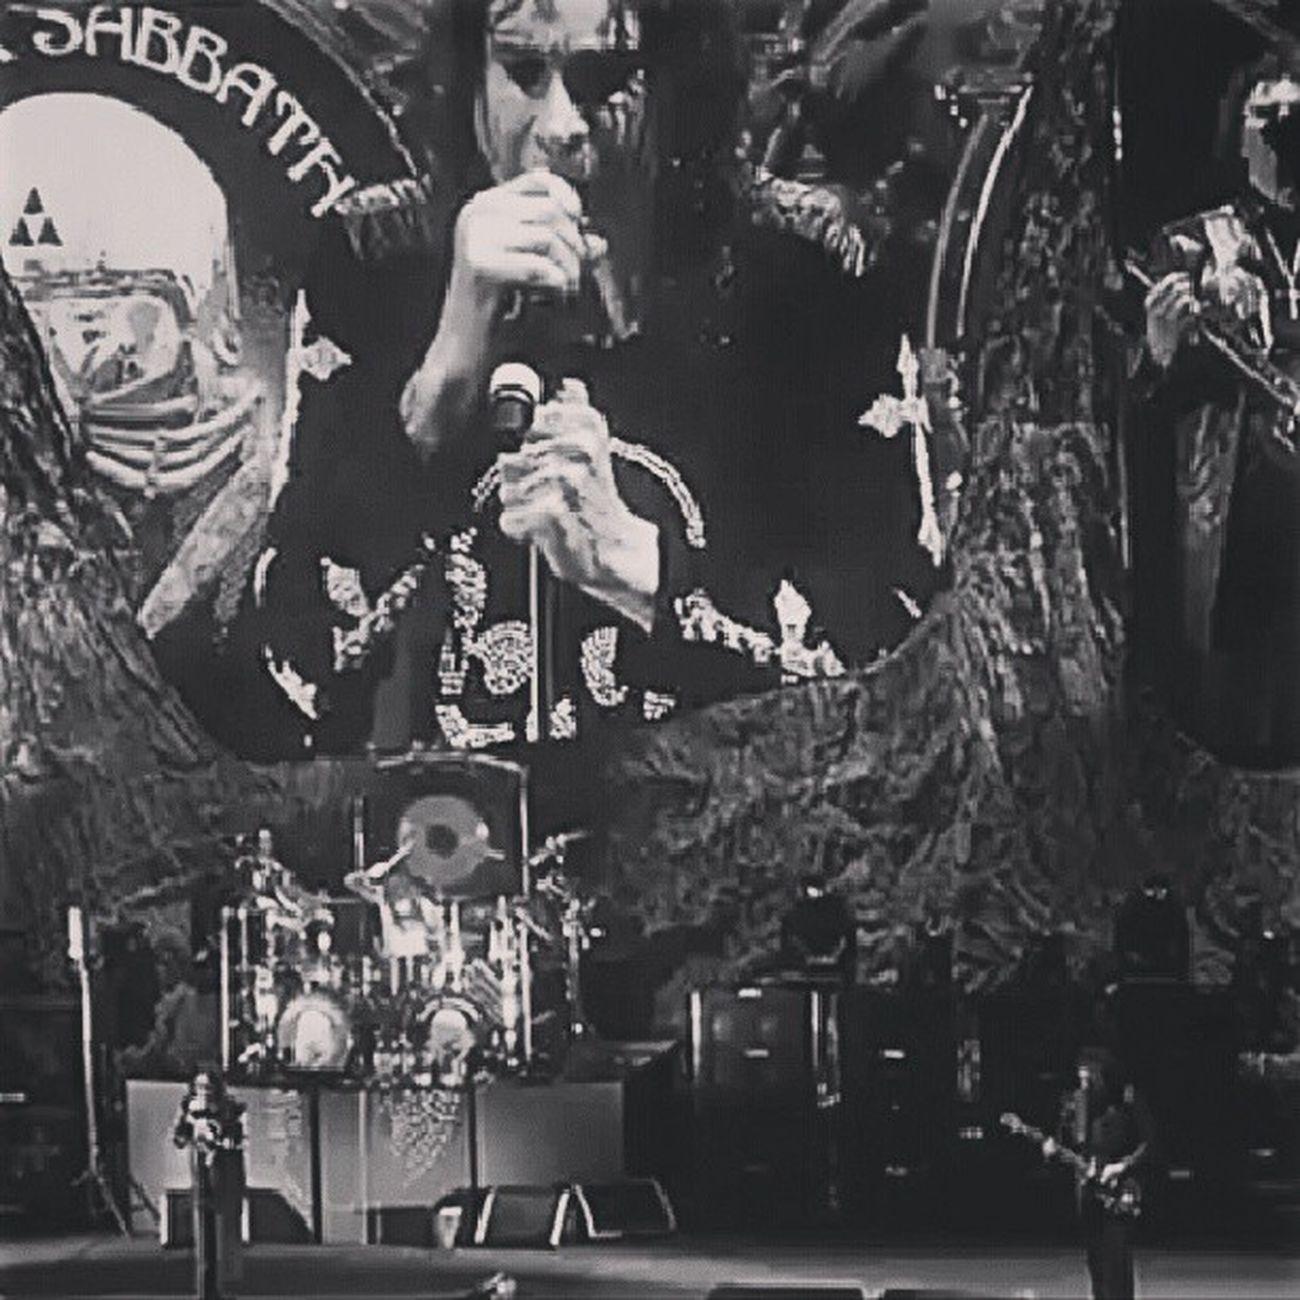 Blacksabbath Ozzy Metal Heavymetal paranoid warpigs music vinyl guitar 13 metal ironman osbourne ozzyosbourne geezer tommyiommi sabbath live in brisabane 2013 australia love like4like band followforfollow rock awesome stage bass blackandwhite